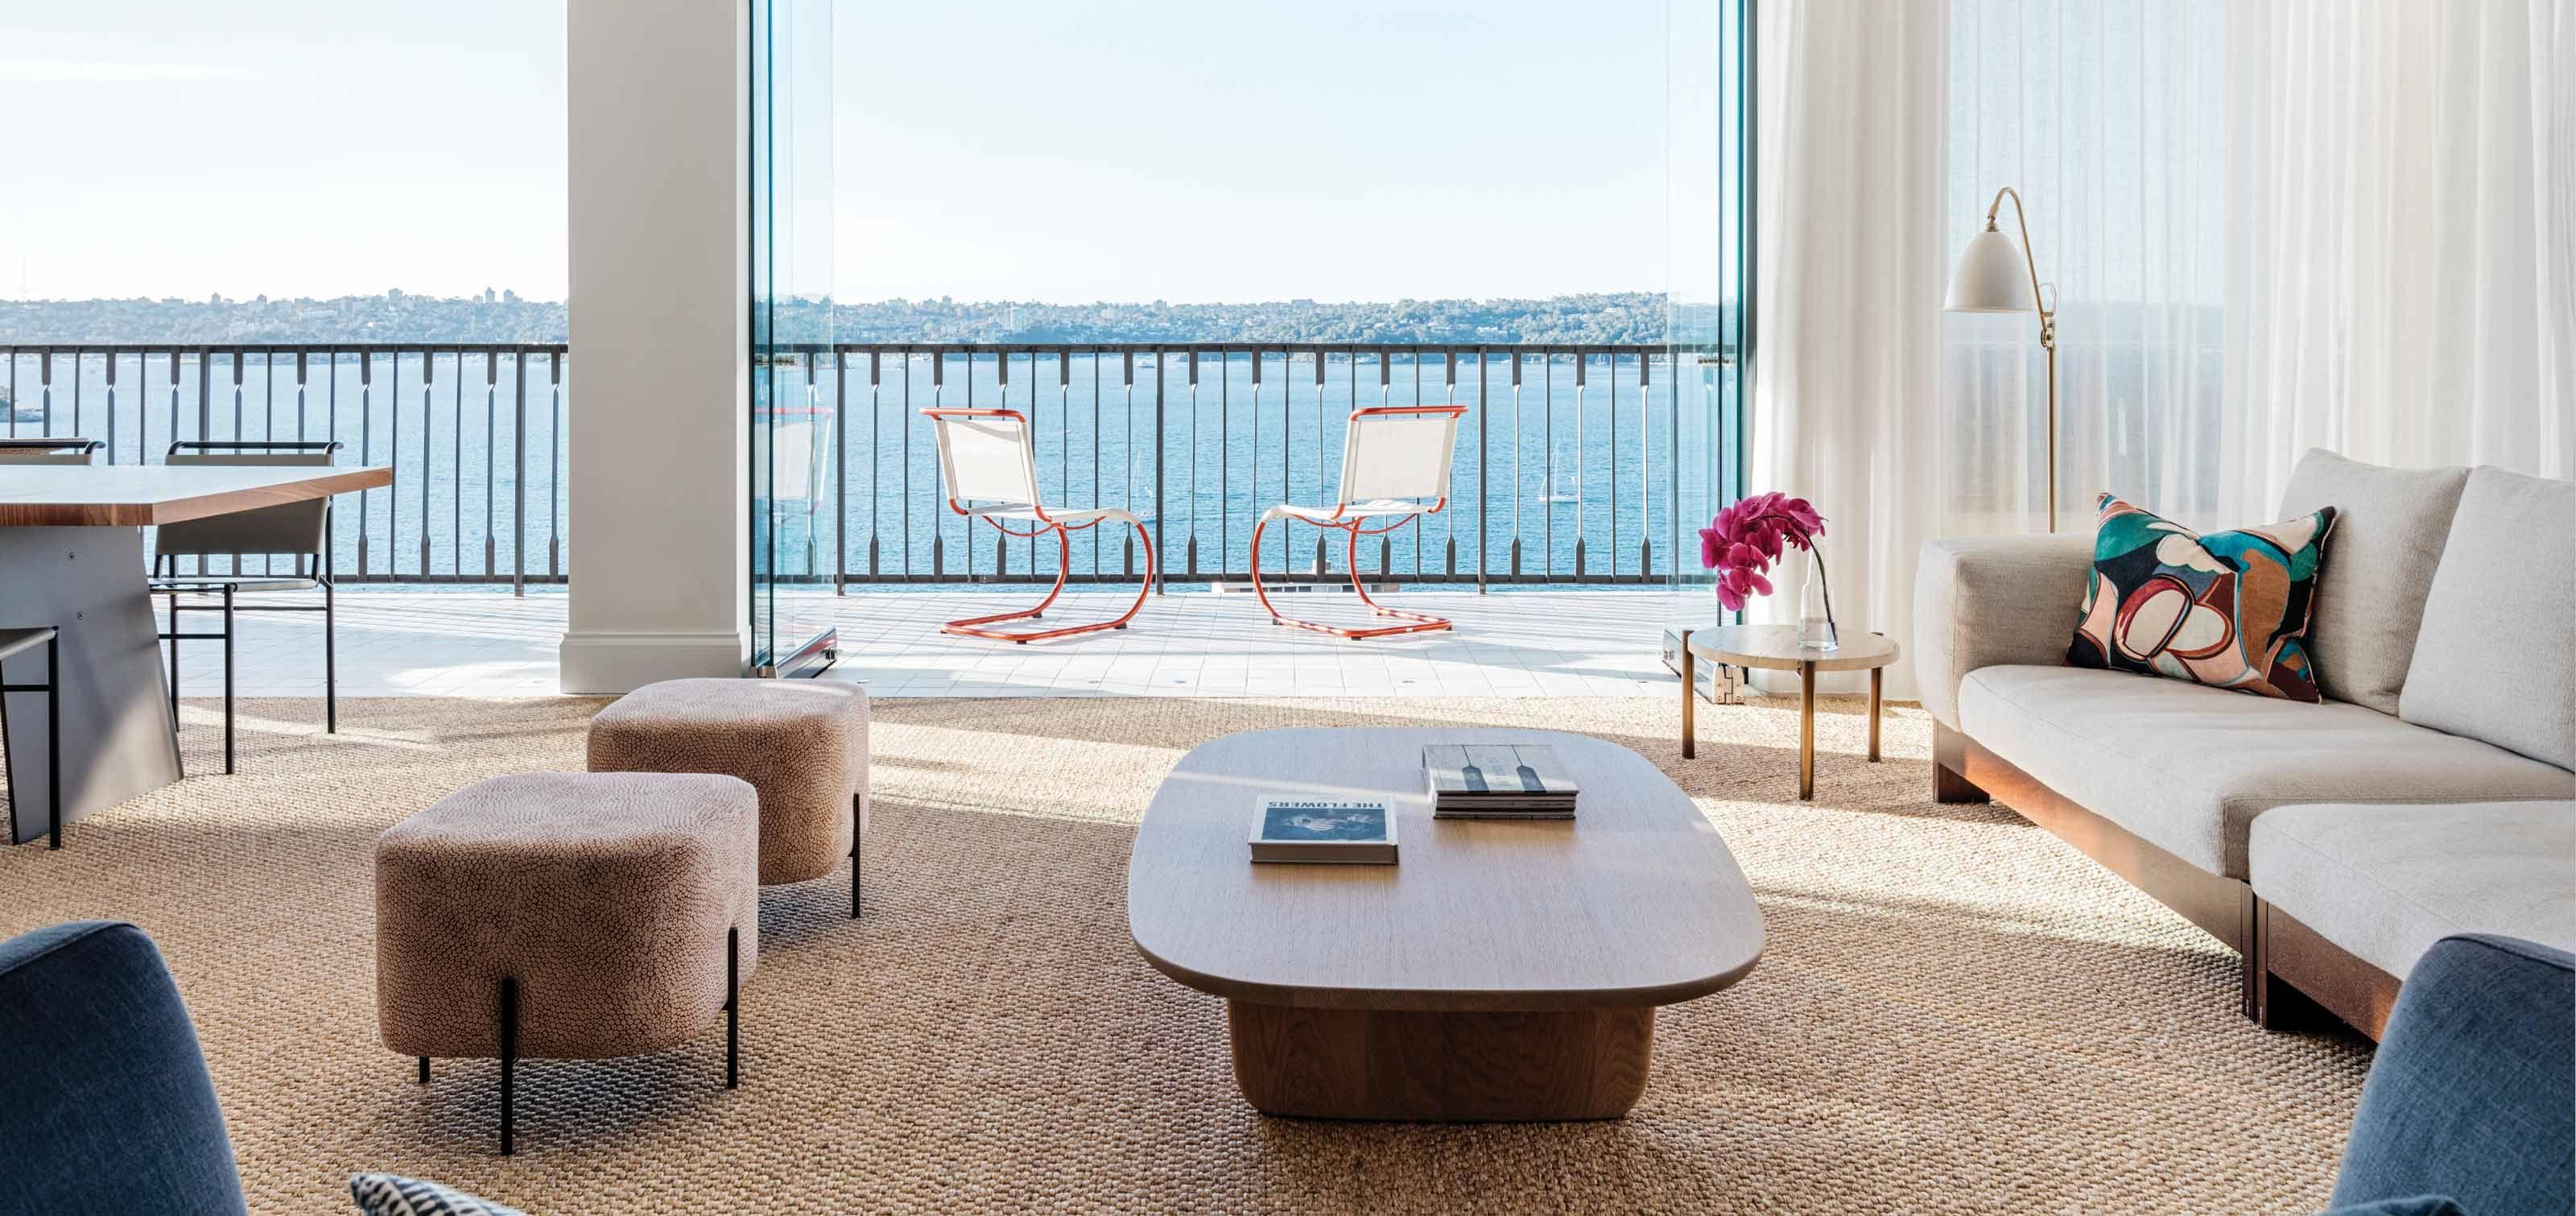 21 cool balcony ideas stylish balcony decorating tips and photos rh housebeautiful com